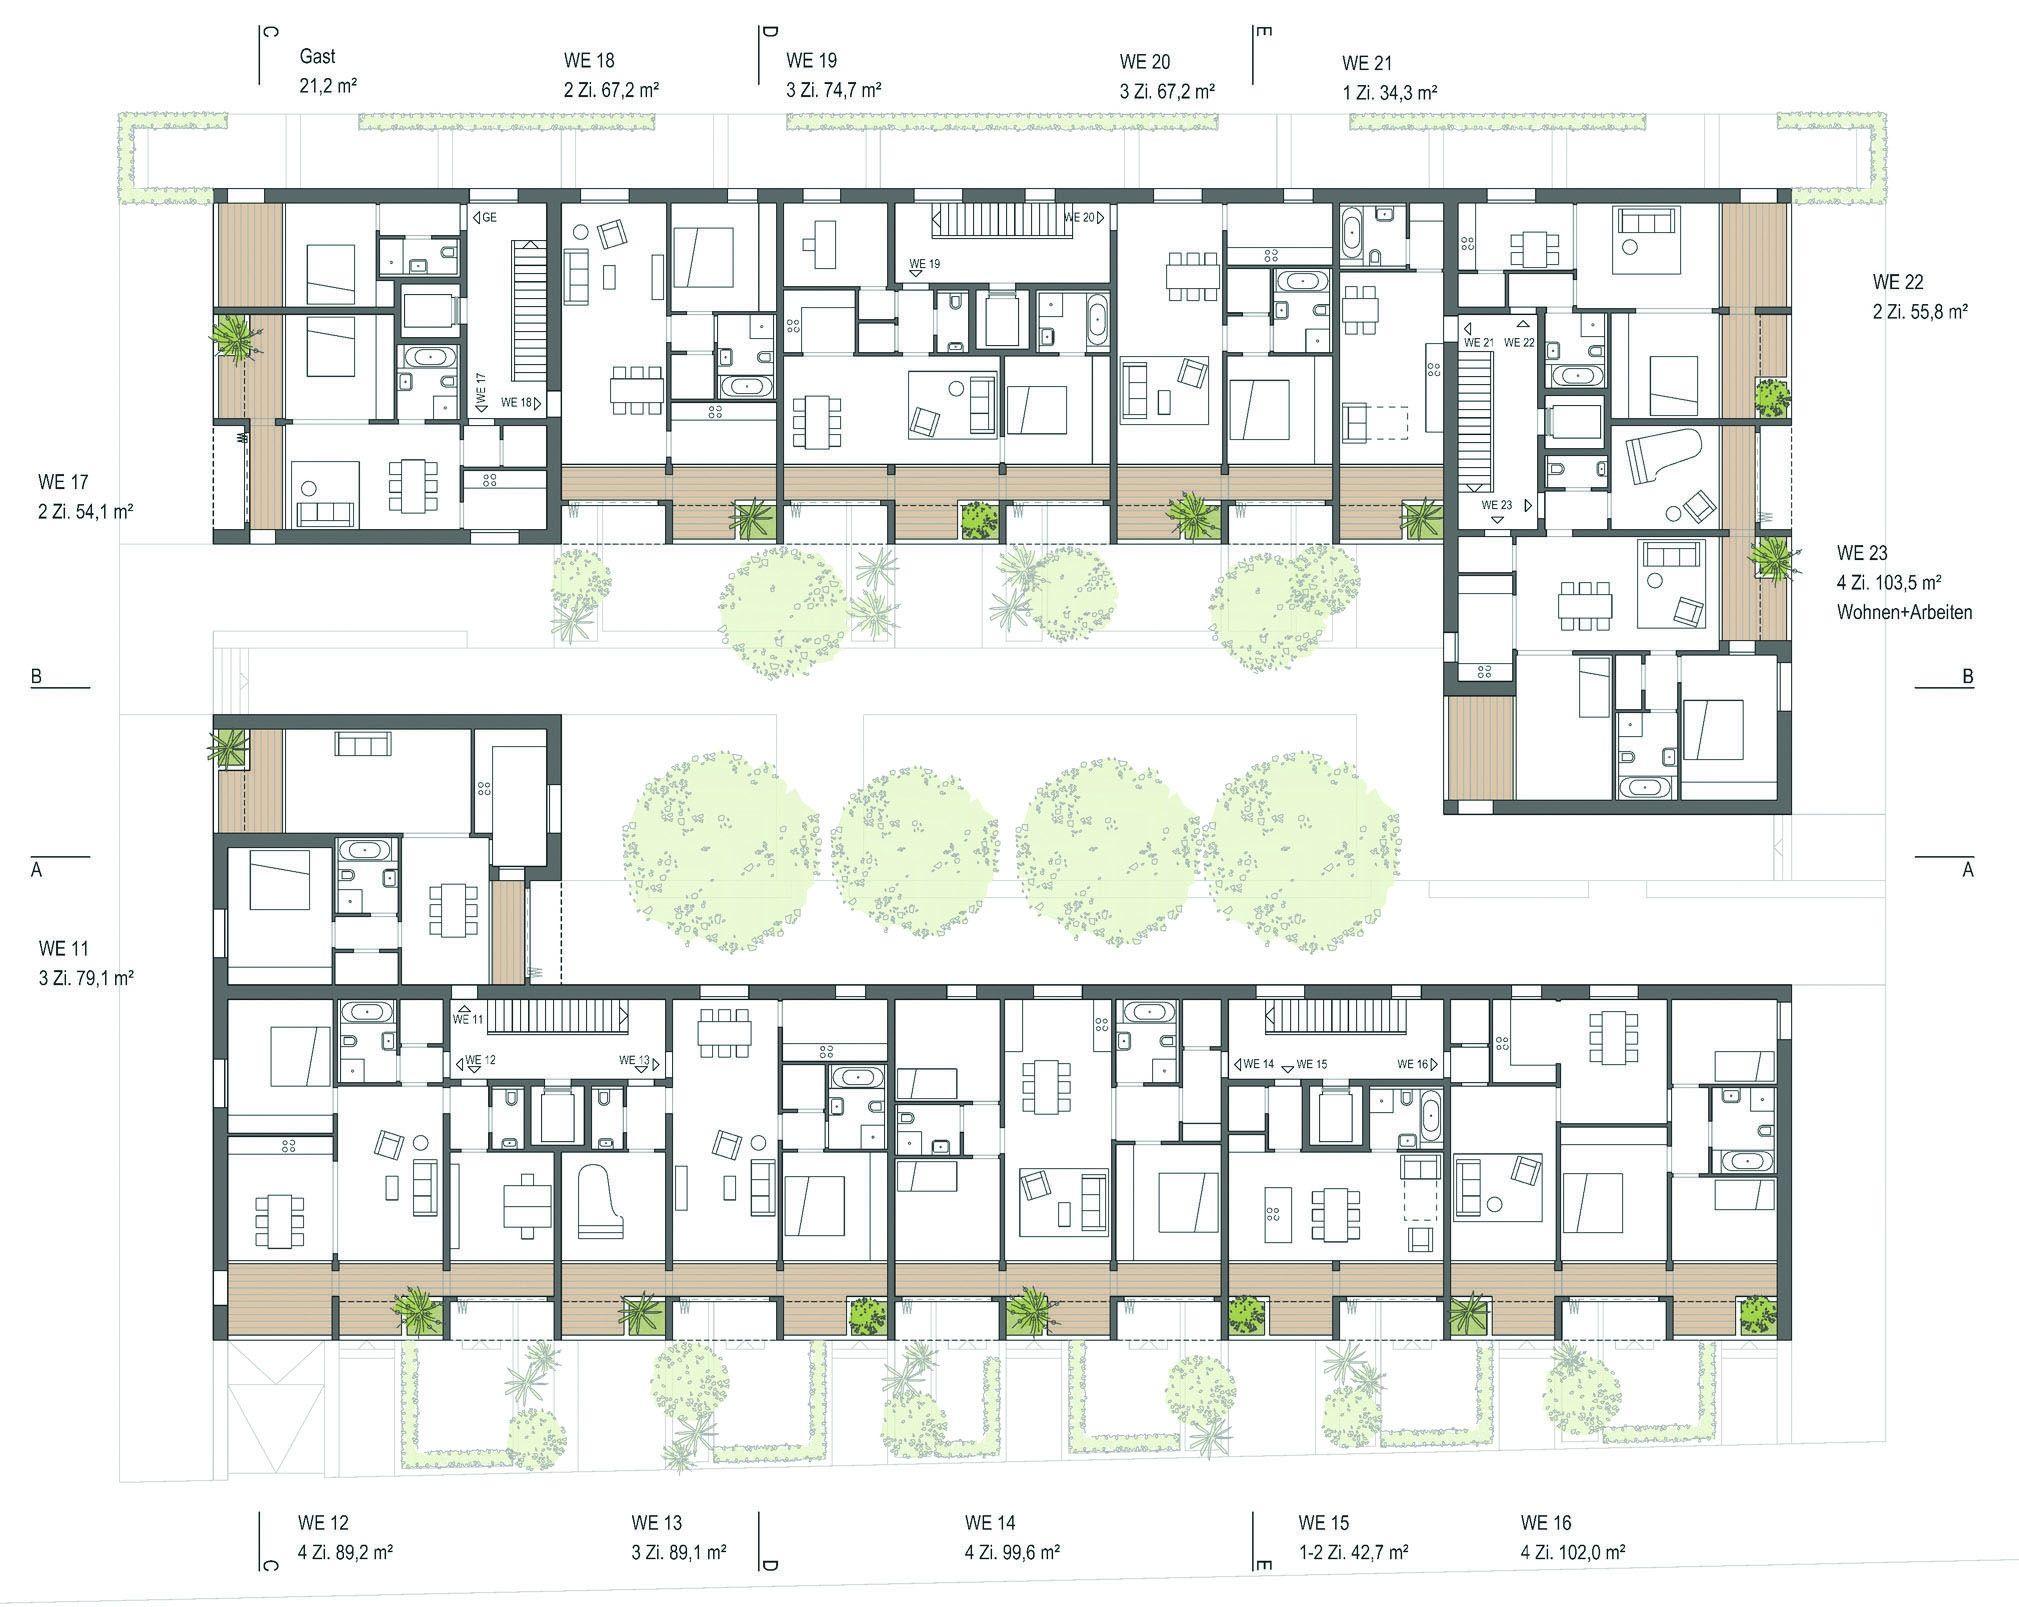 gewinner baublock b wohnhof grundriss 1 obergeschoss. Black Bedroom Furniture Sets. Home Design Ideas